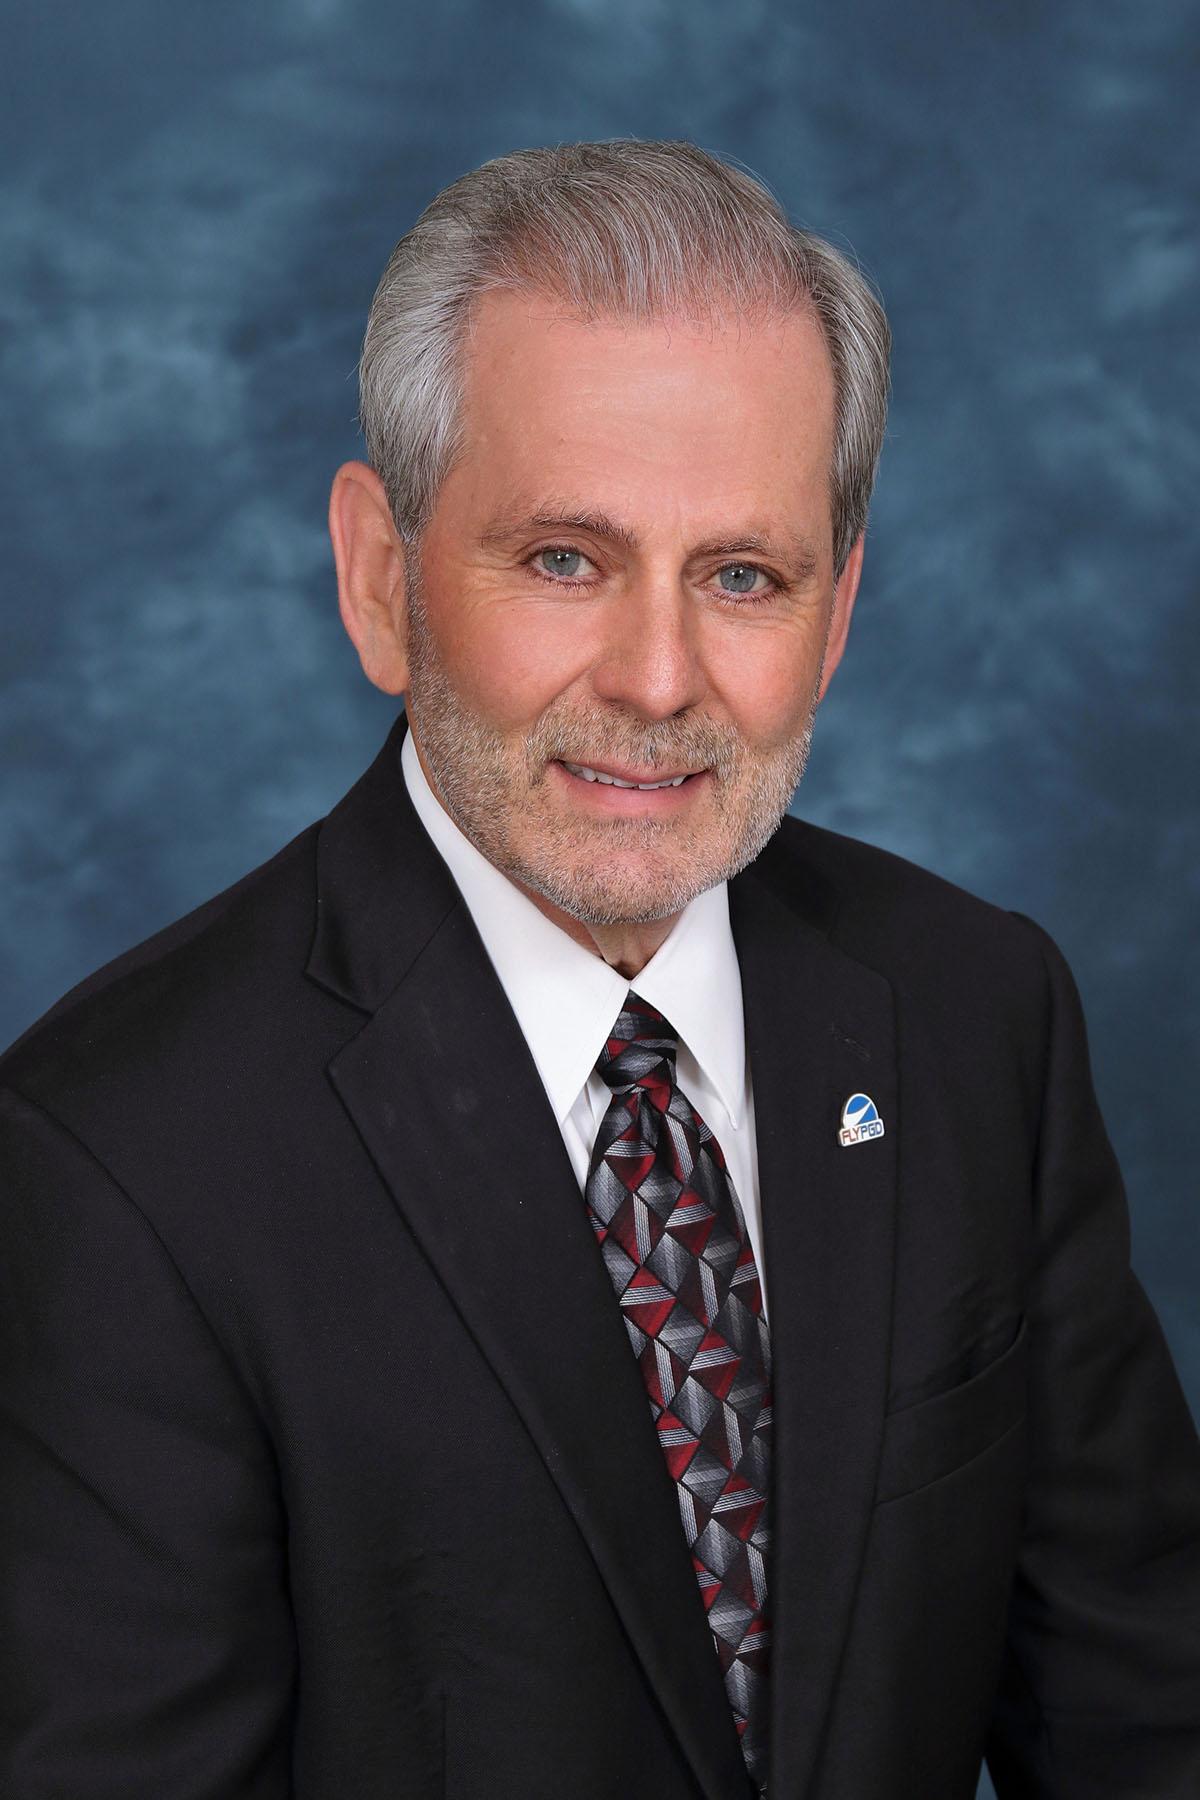 Commissioner James Herston